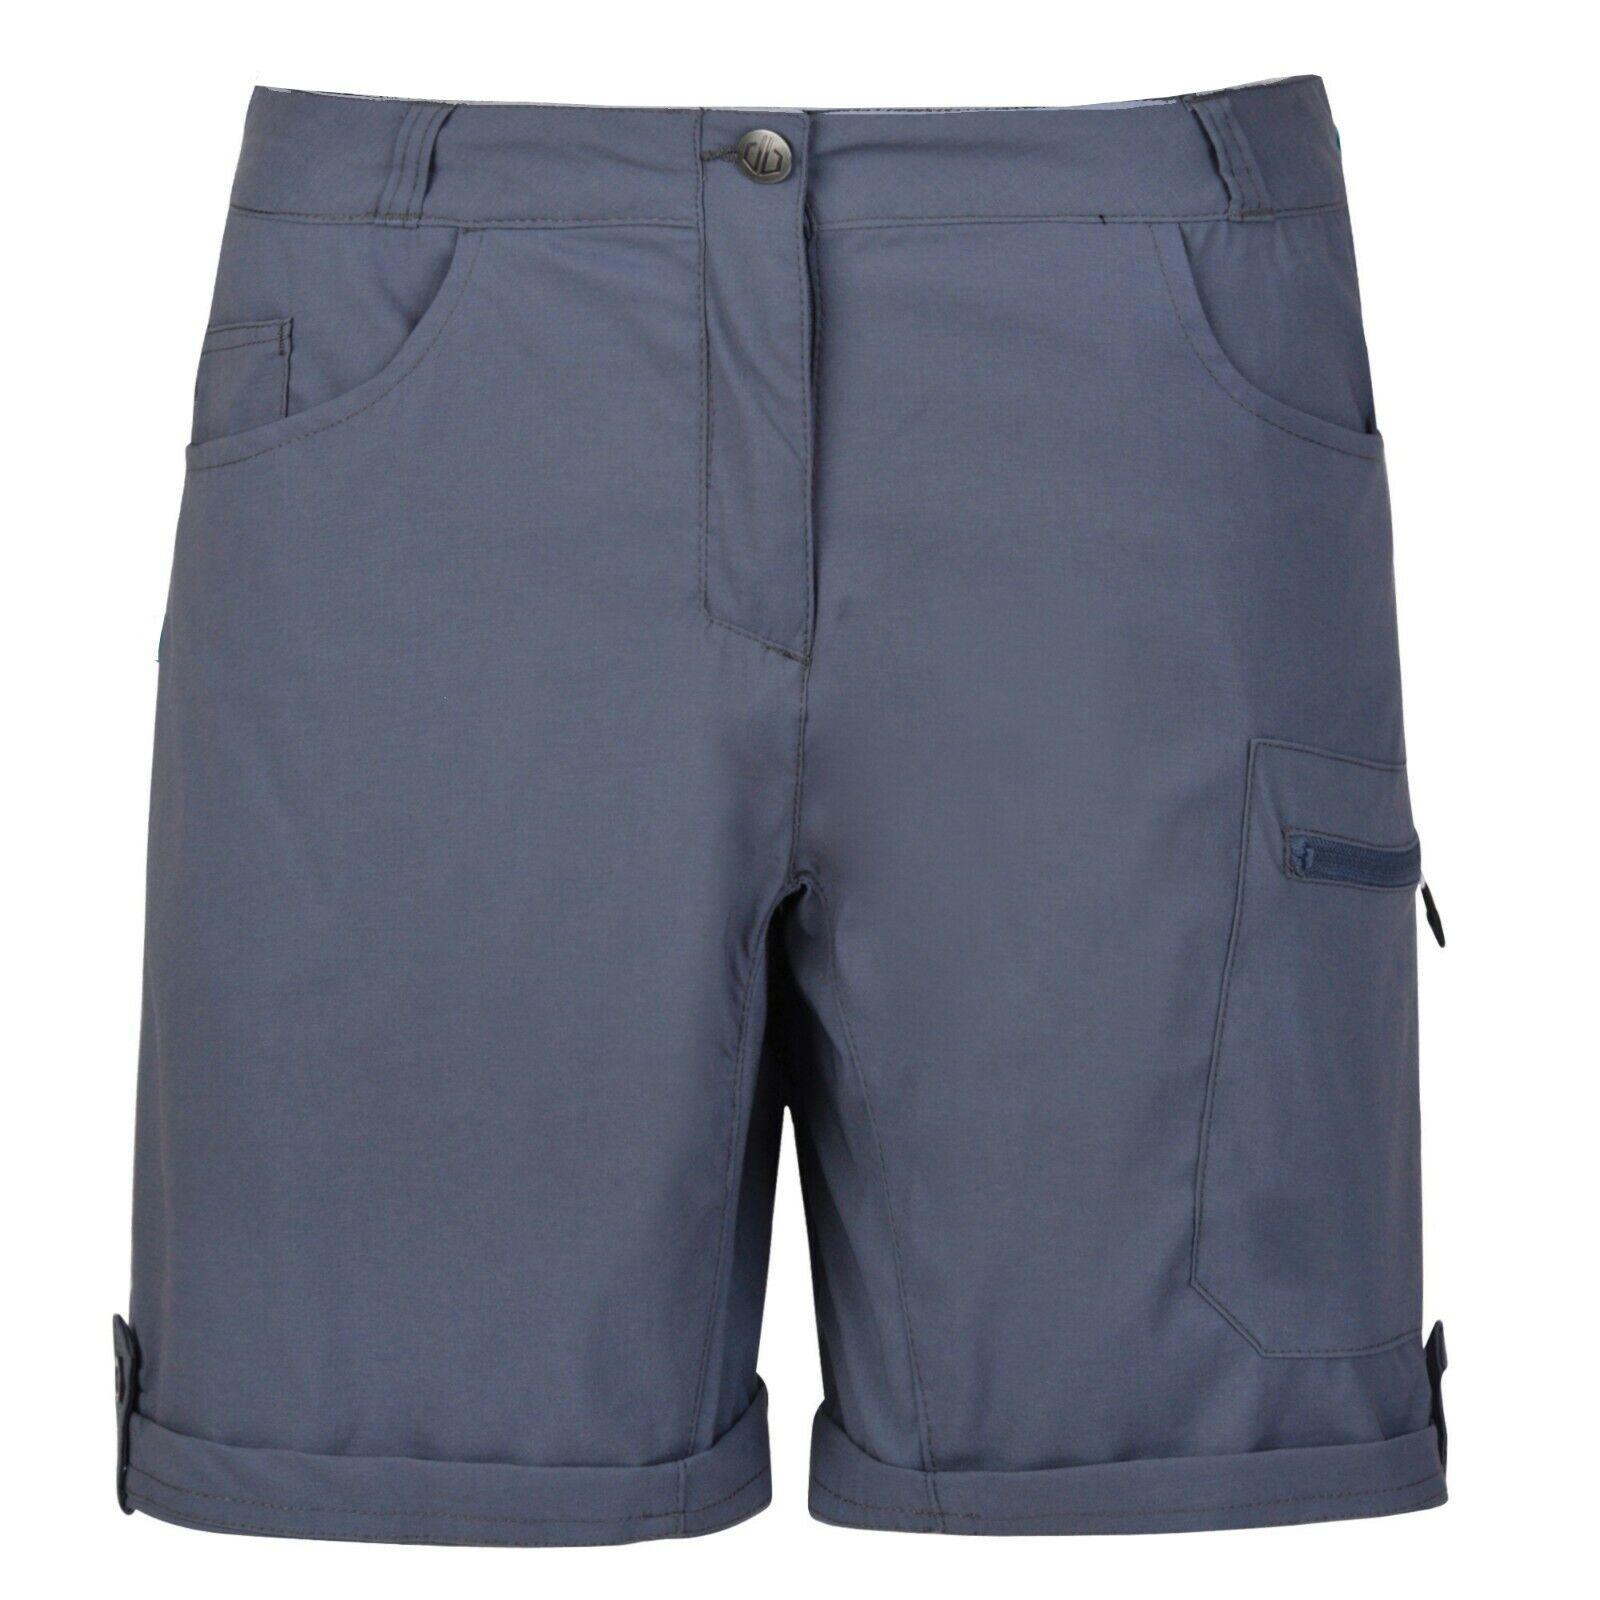 Dare 2b melodic II daSie Hiking Shorts Outdoor Shorts Functional Shorts Short Hose